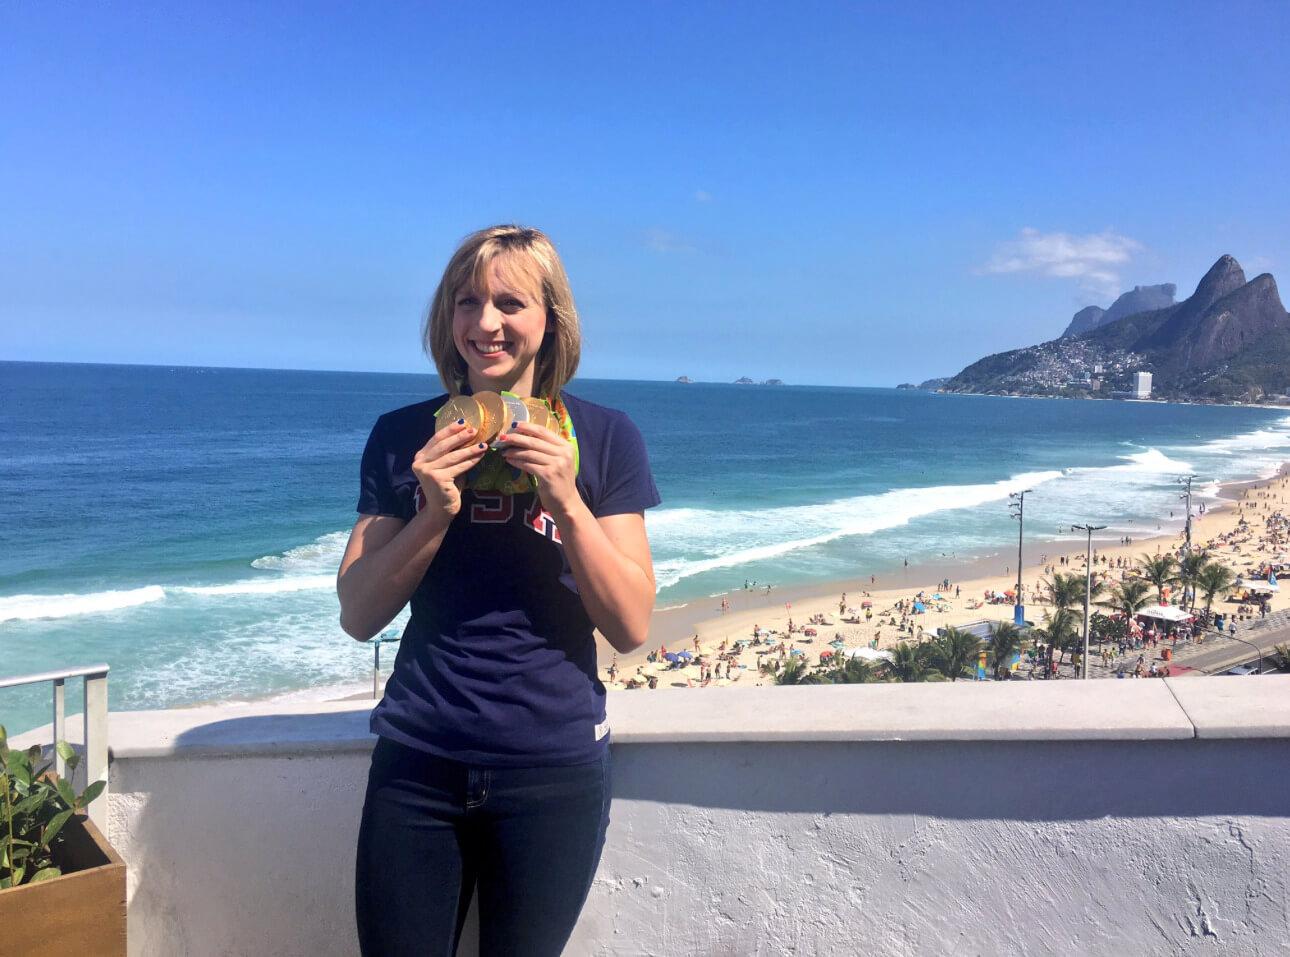 Katie-Ledecky-Michael-Phelps-Rio-2016-2